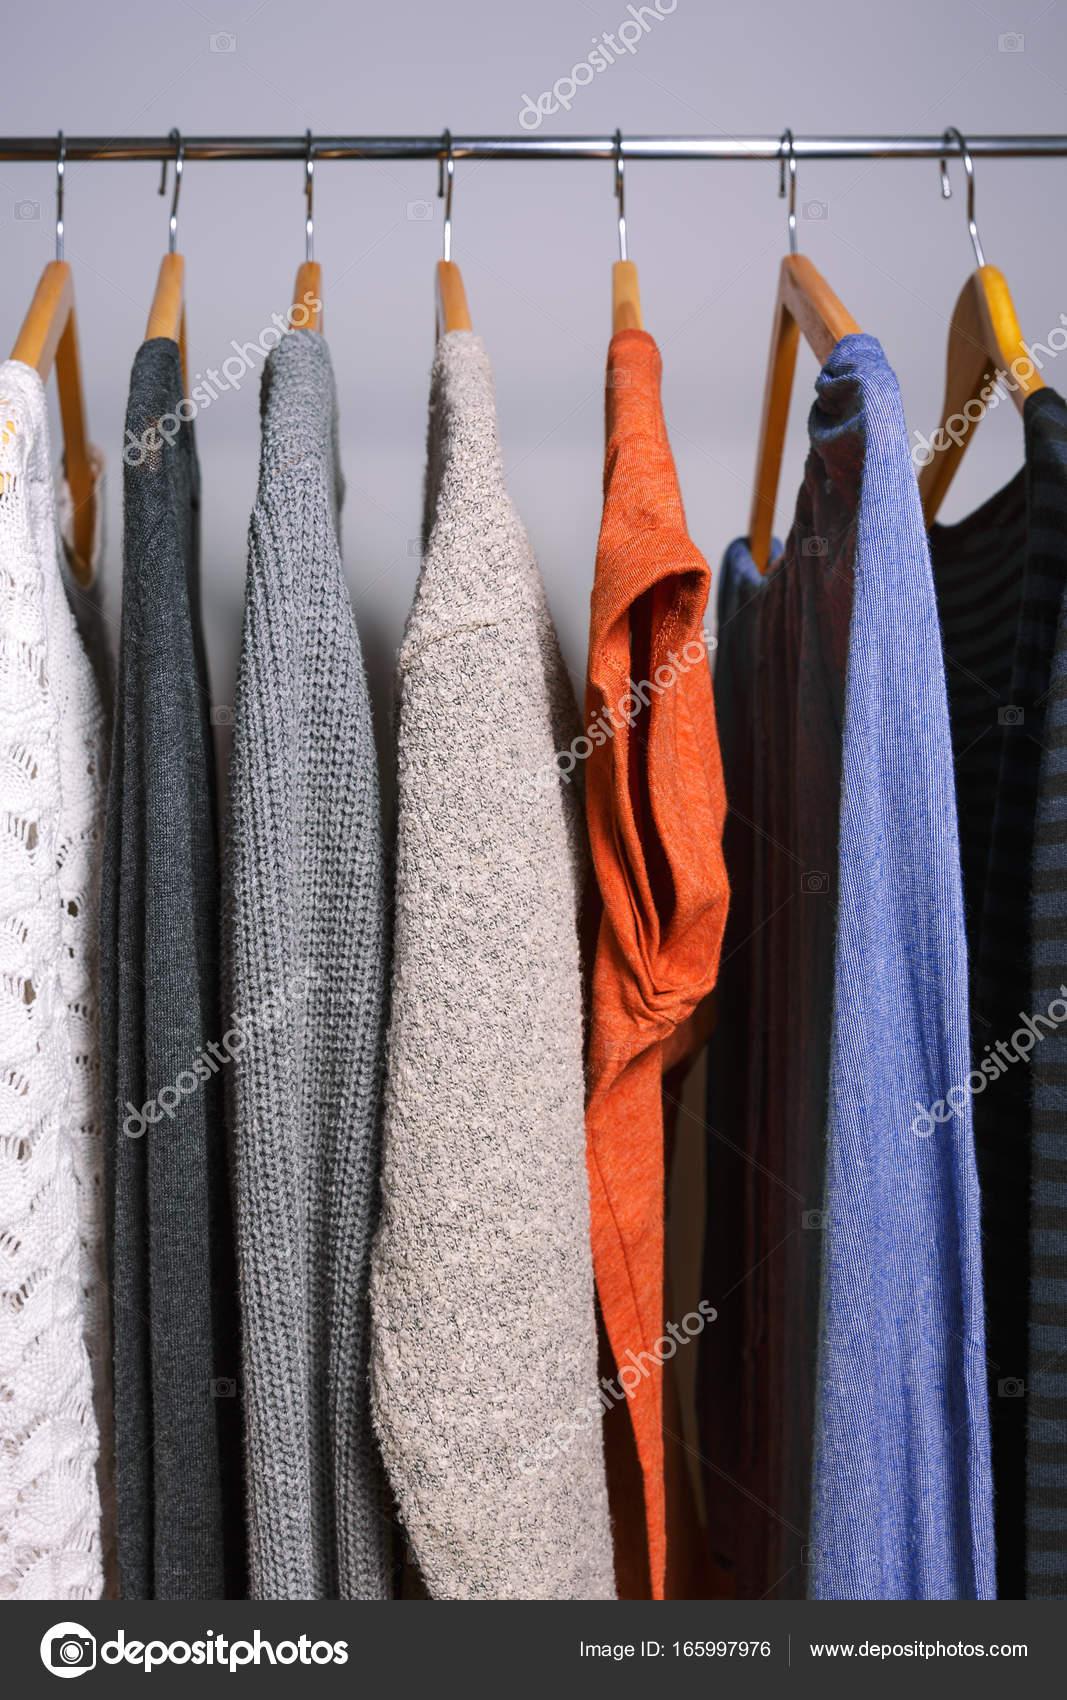 00f946121c Γυναικεία ρούχα κρέμονται από ένα ράφι ρούχα σε ένα κατάστημα ή στο σπίτι  ντουλάπα– εικόνα αρχείου